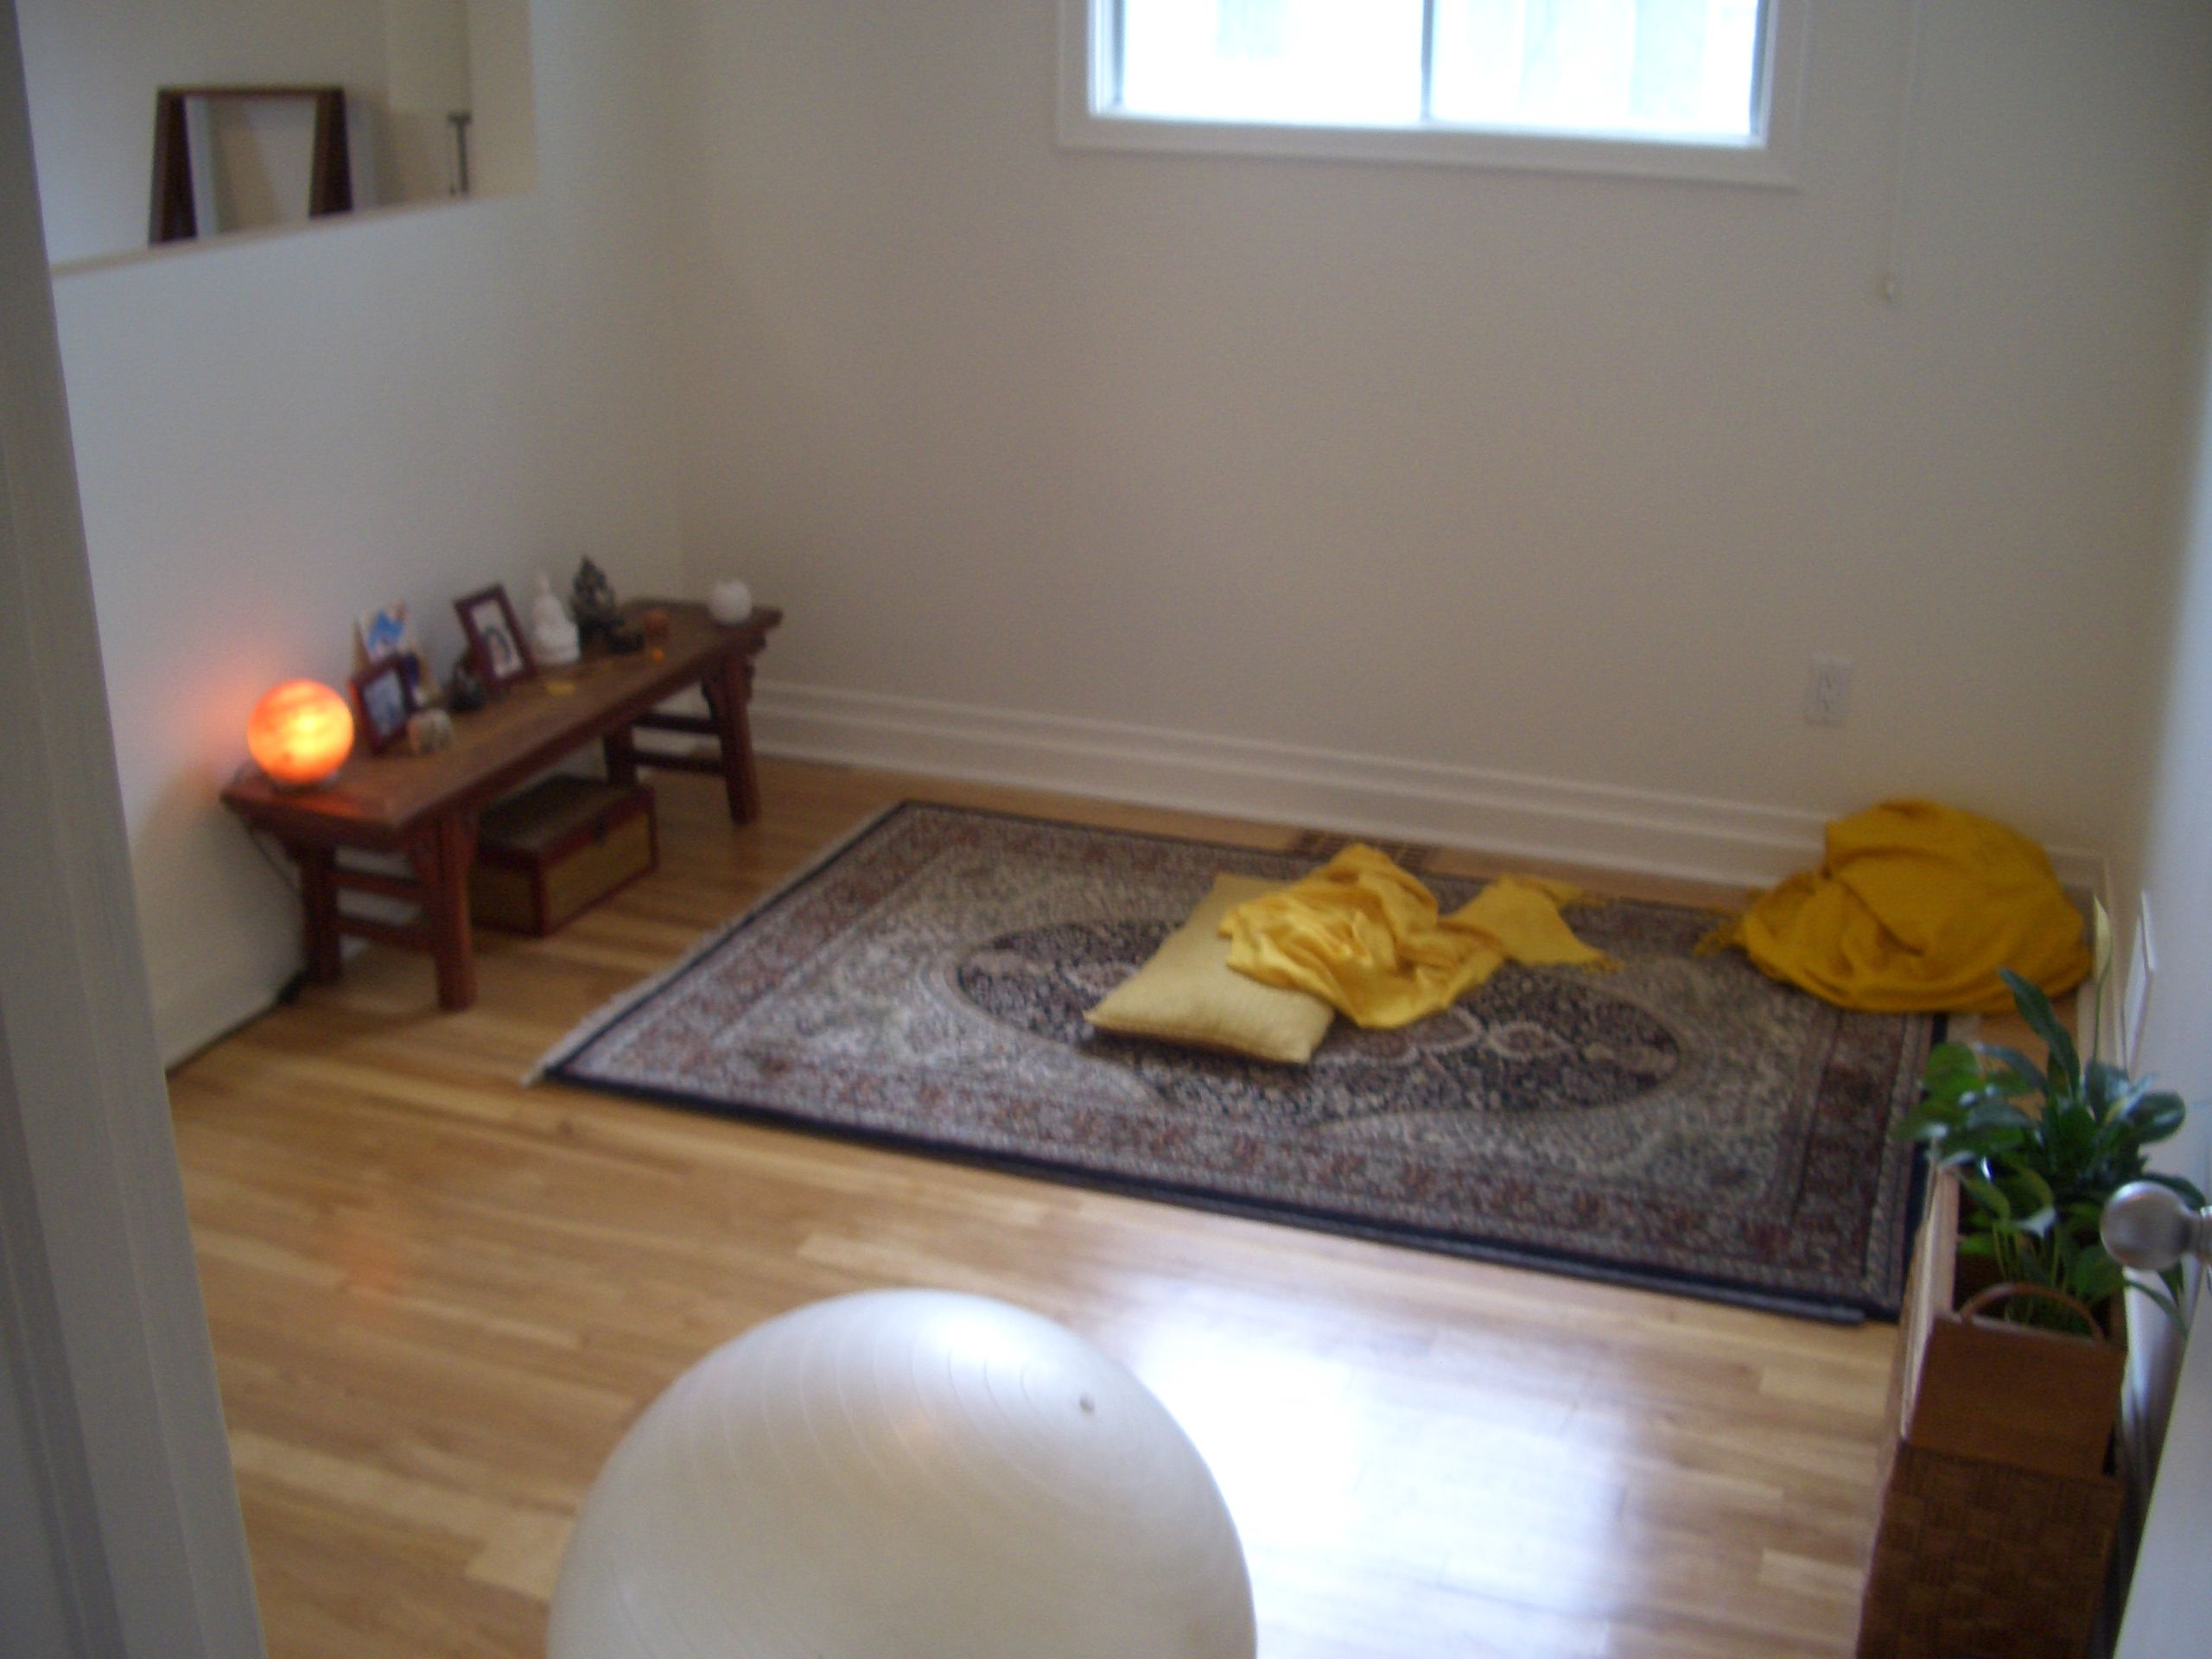 Yoga Decorations For A Room Novocom Top